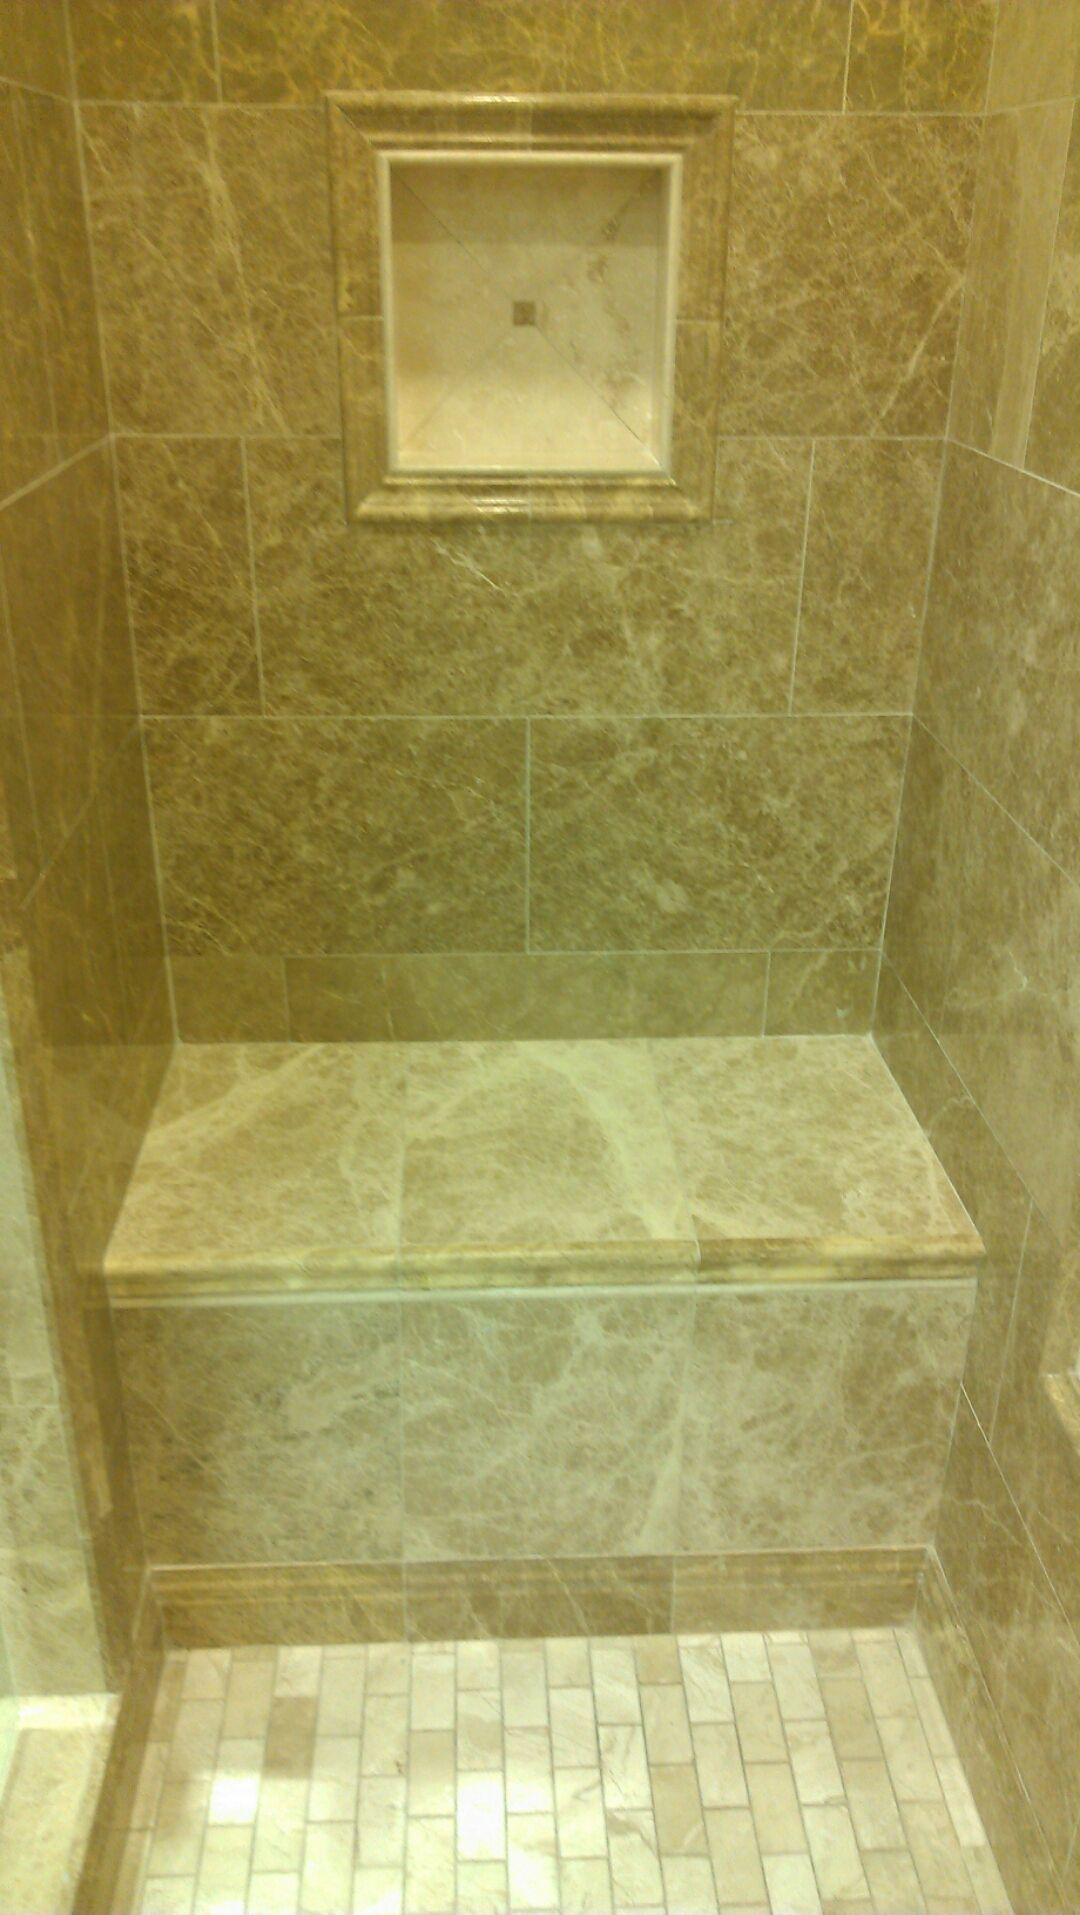 Travertine Shower with a Niche and a Travertine Bench | Bath ...